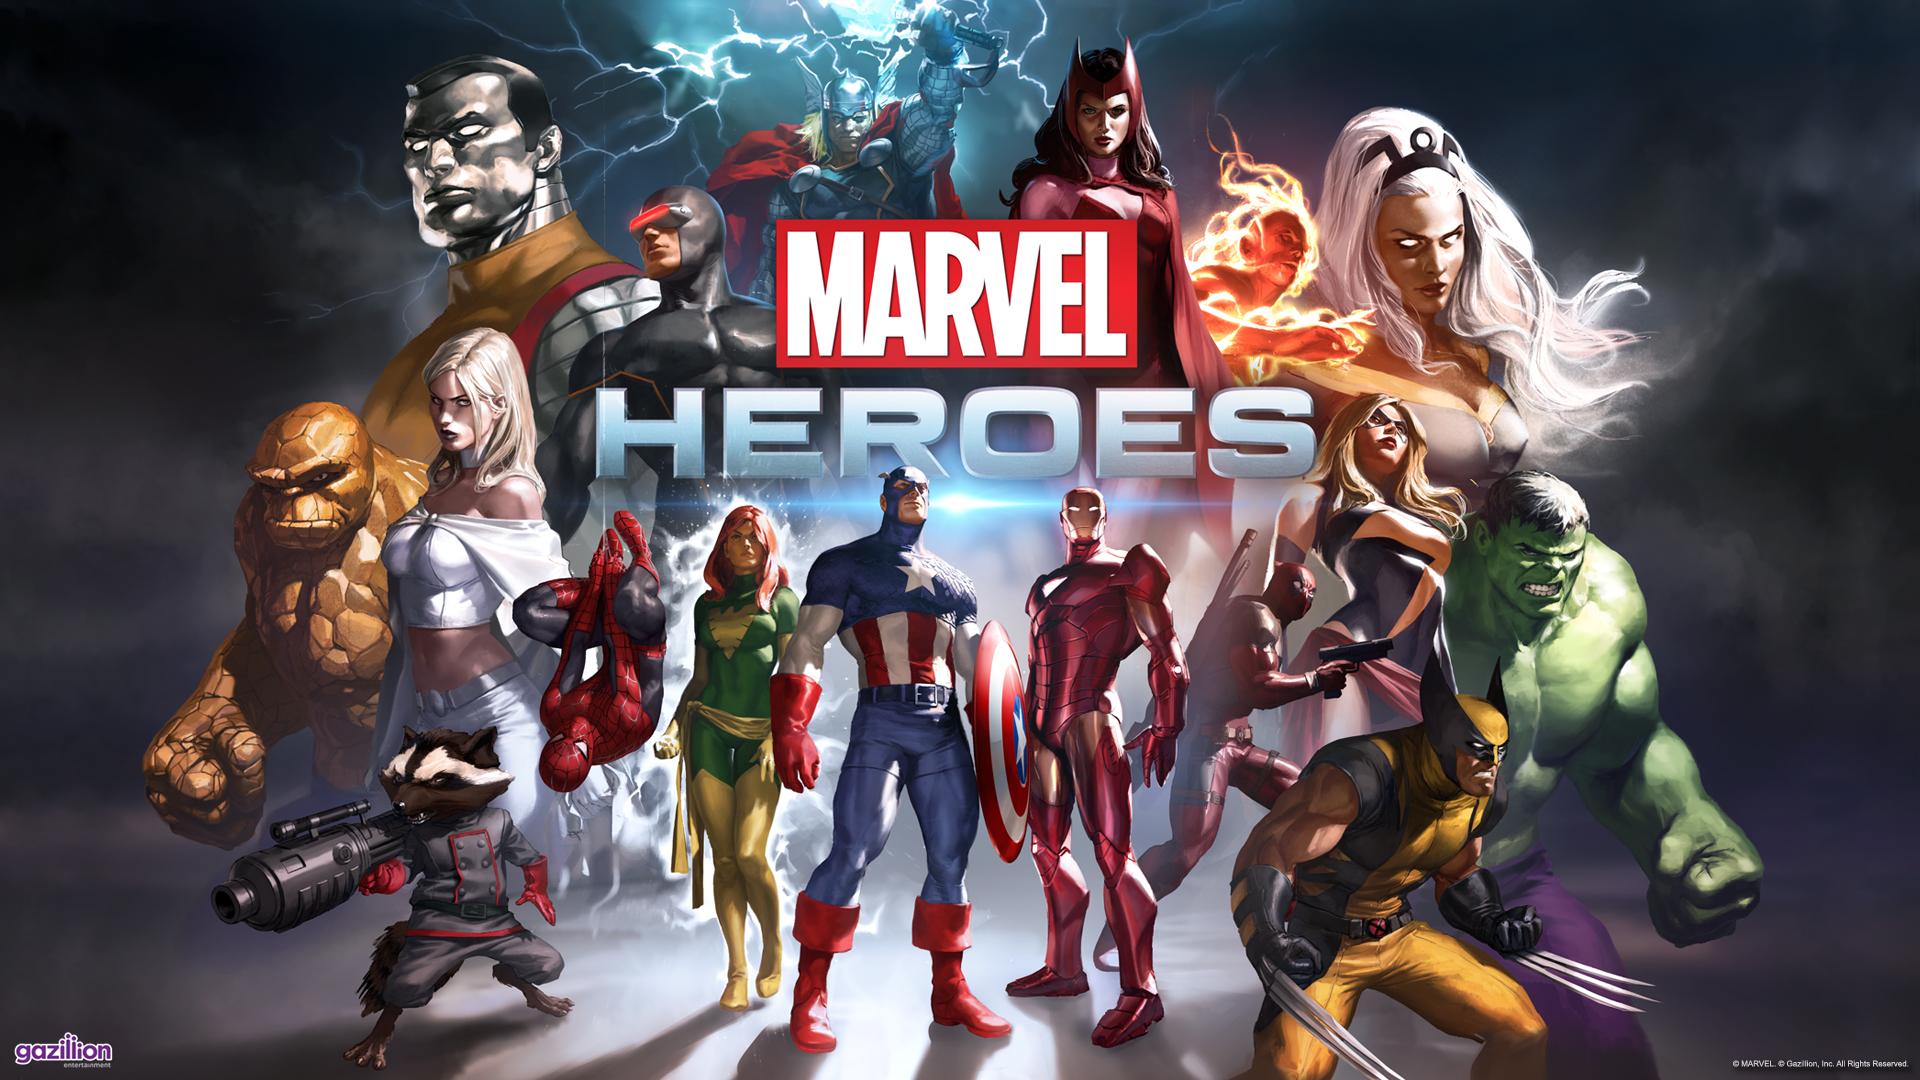 download marvel heroes wallpaper 1920 1080 pixel full hd resolution 1920x1080